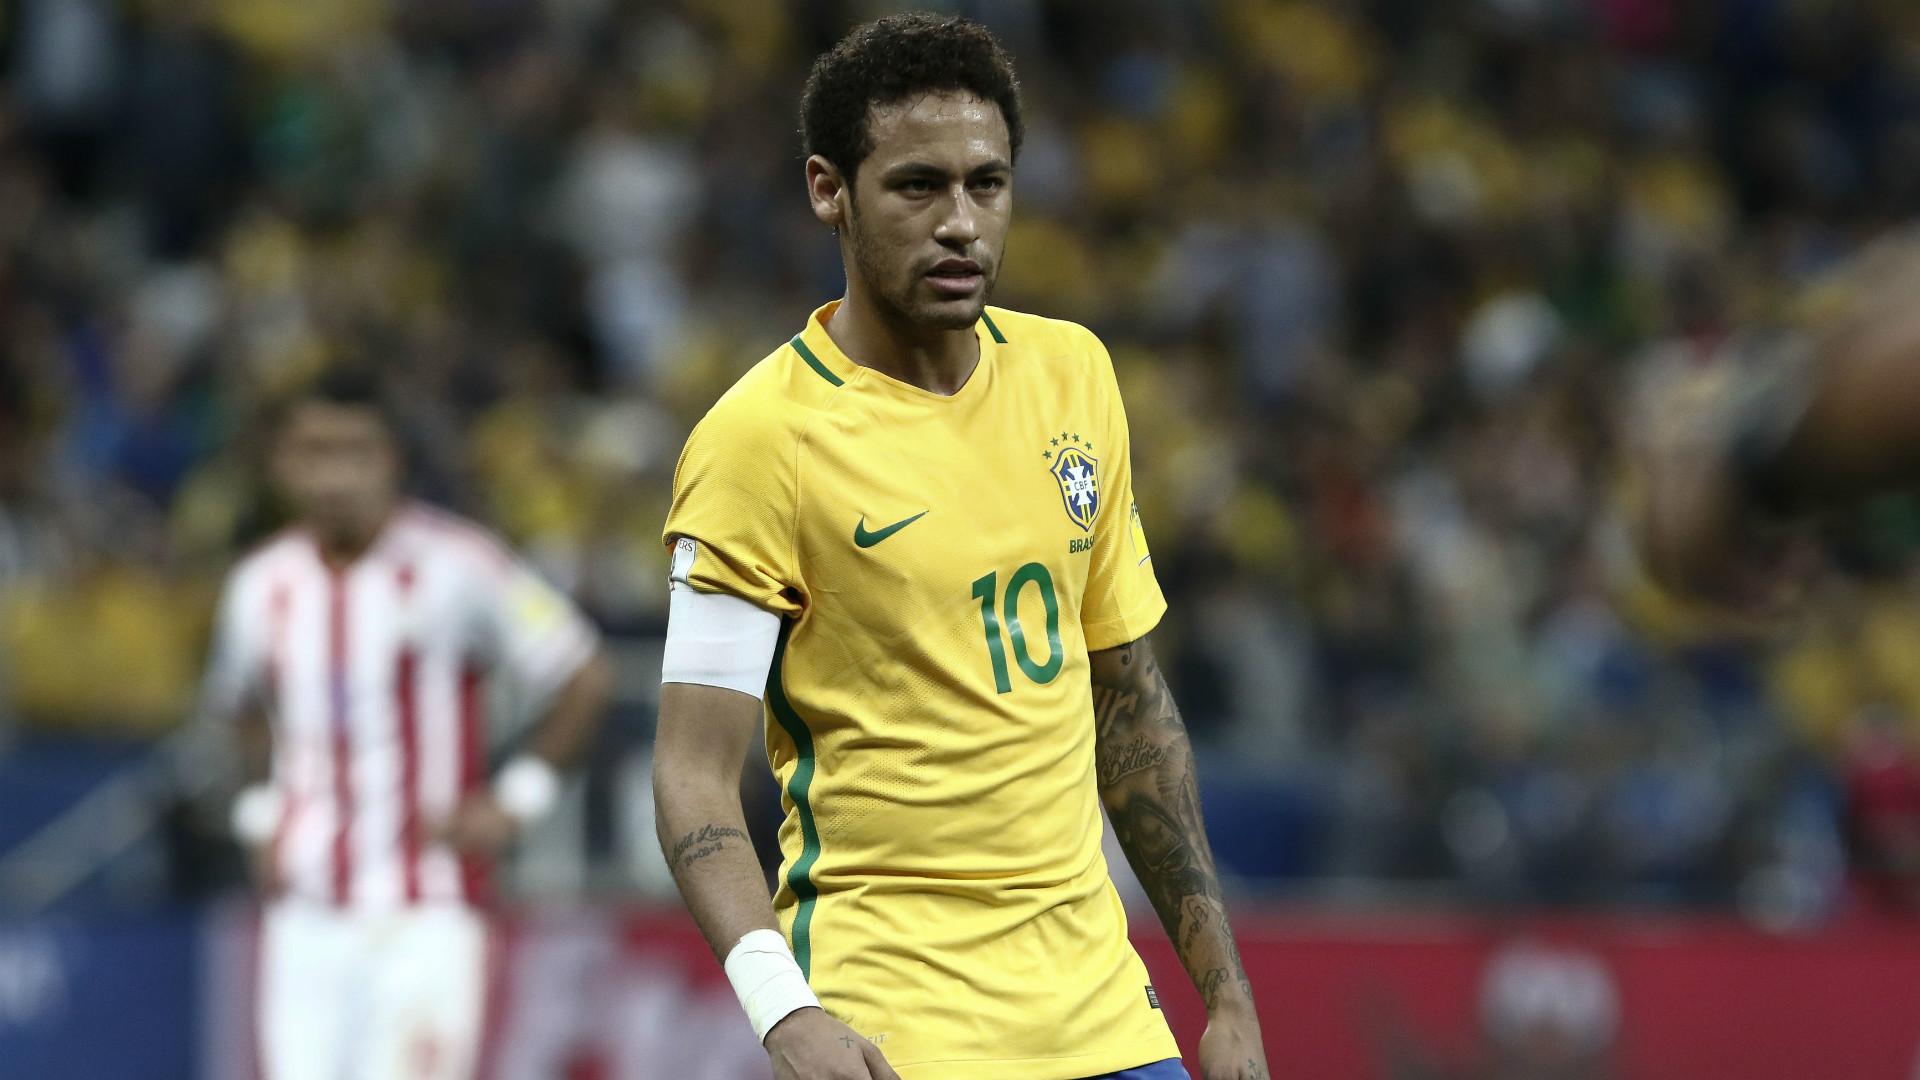 neymar-brazil_1emz32c0qcs1c1bh7s5s7a2p8h